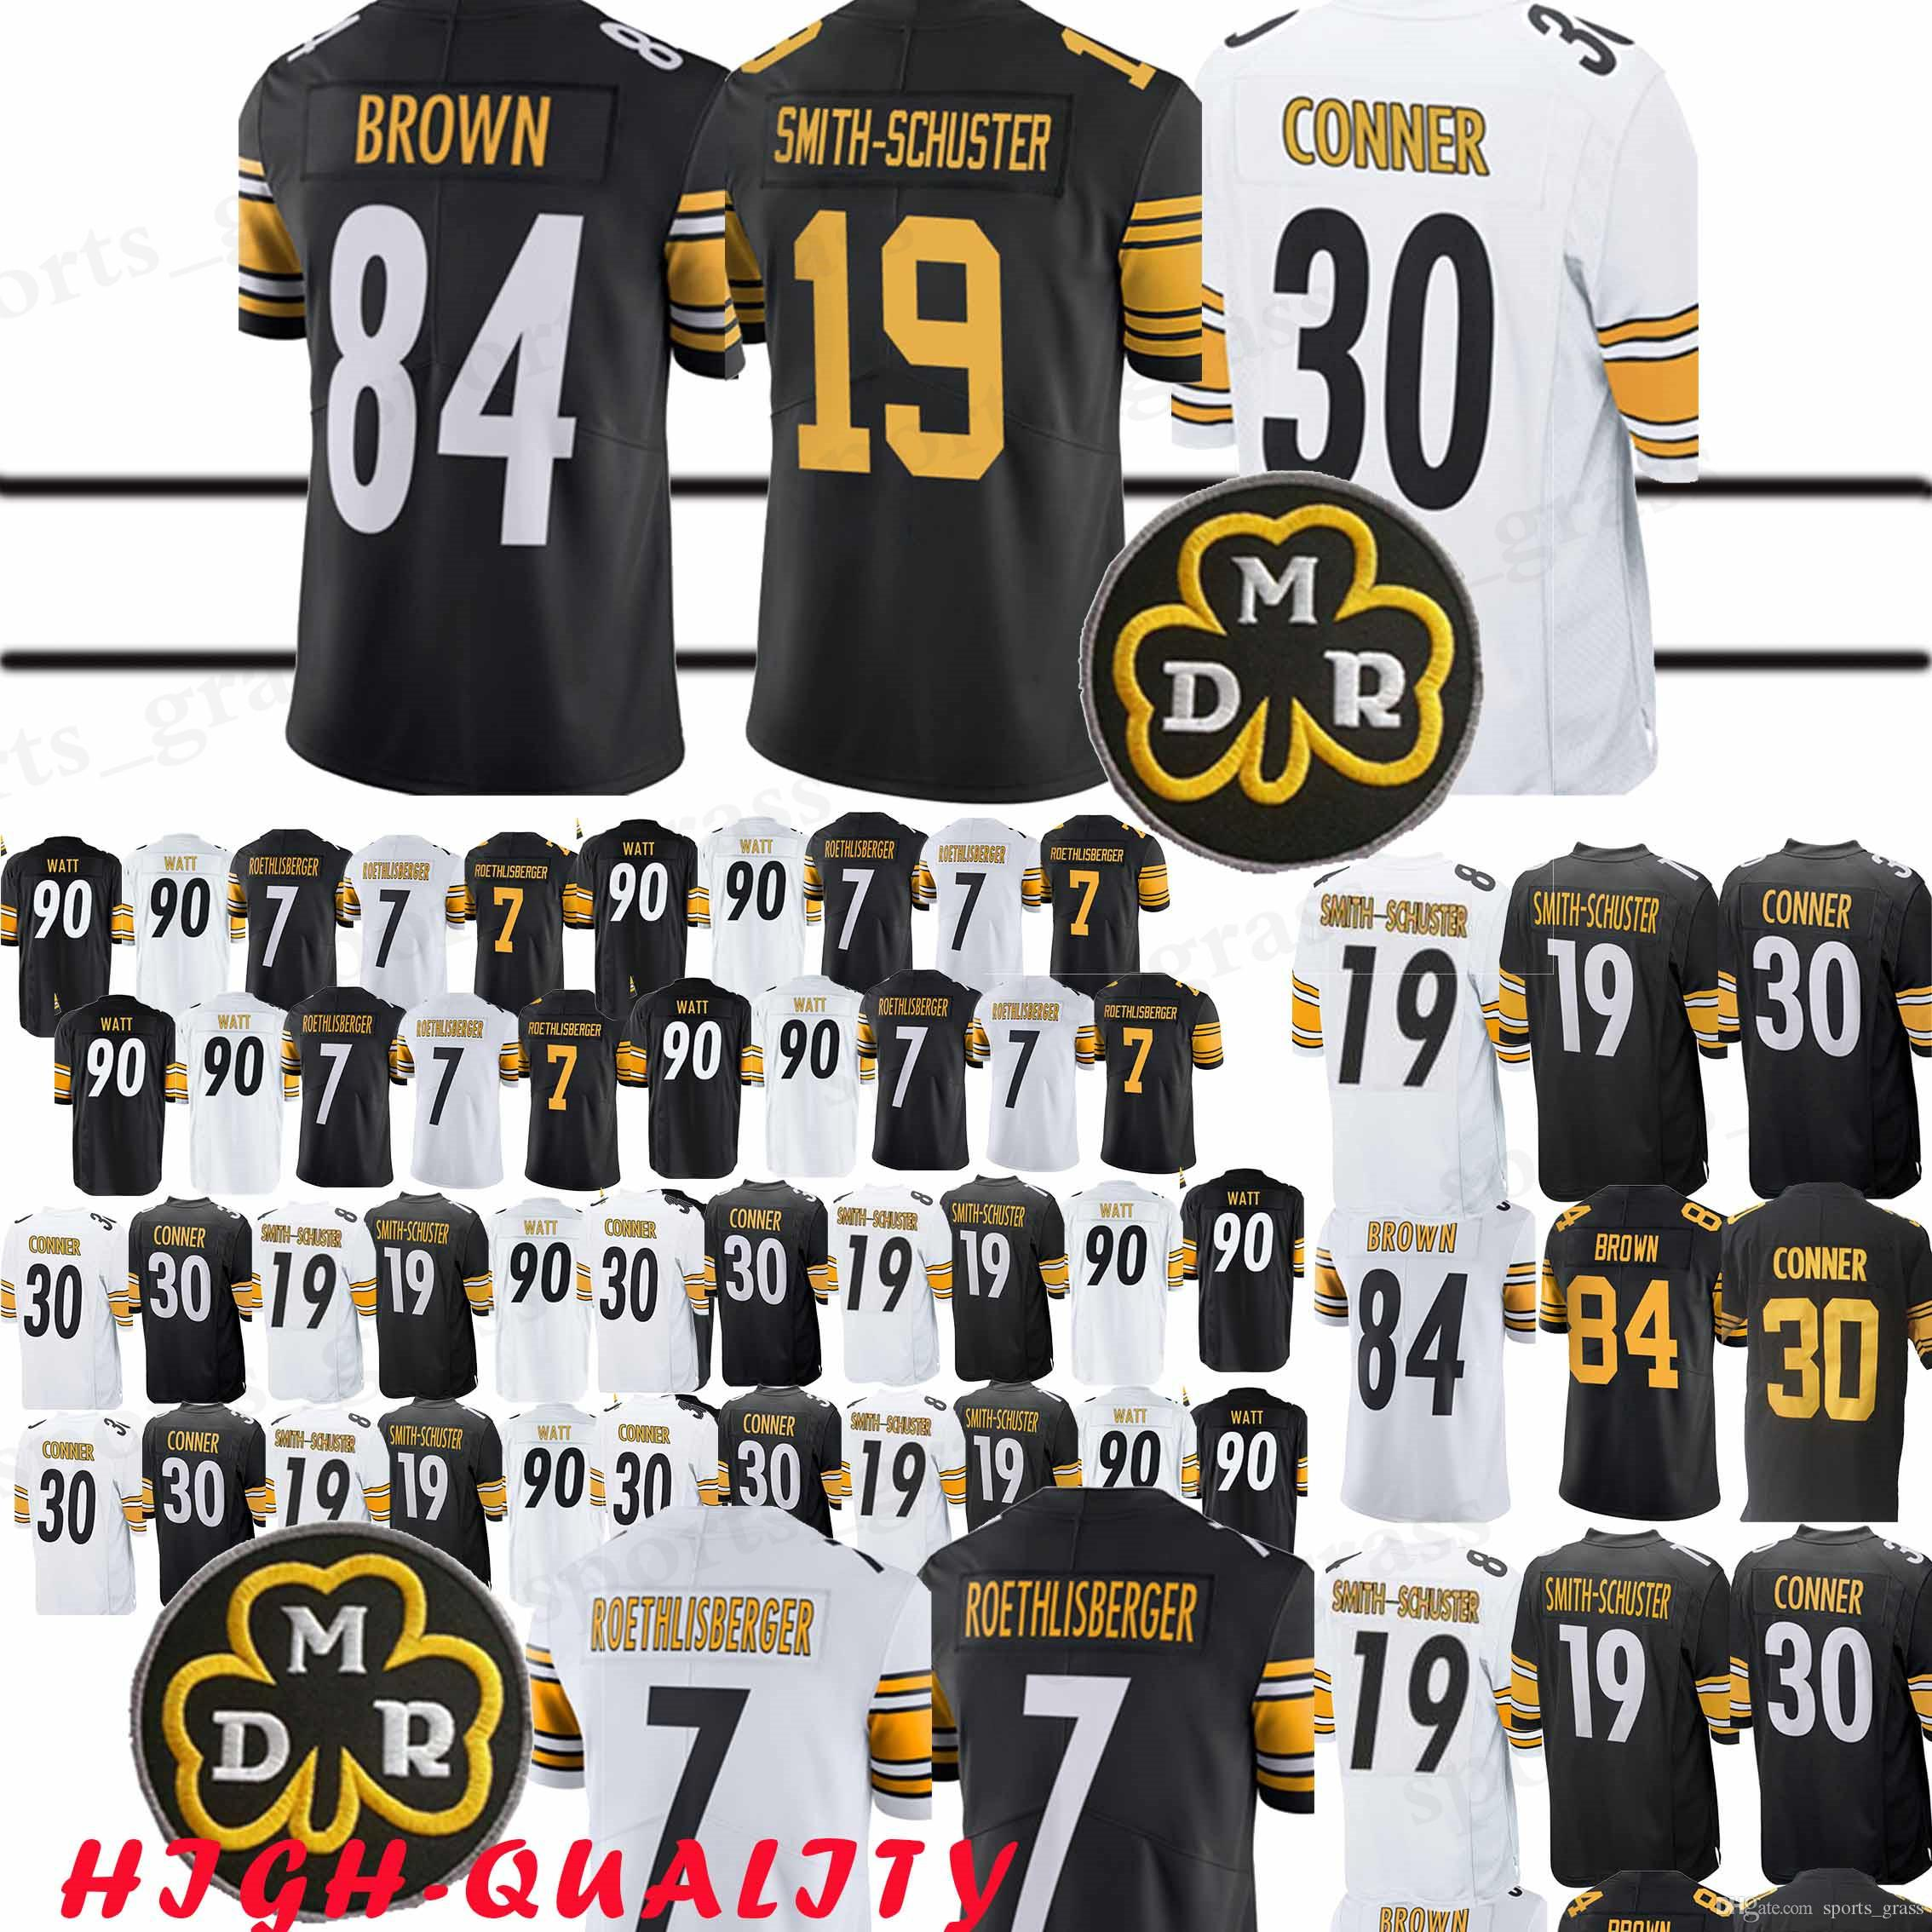 6c416dce6 2019 30 James Conner 84 Antonio Brown 2019 Pittsburgh Jerseys 7 Ben  Roethlisberger Steeler 19 Juju Smith Schuster 90 T.J. Watt Jerseys 2019 New  From ...